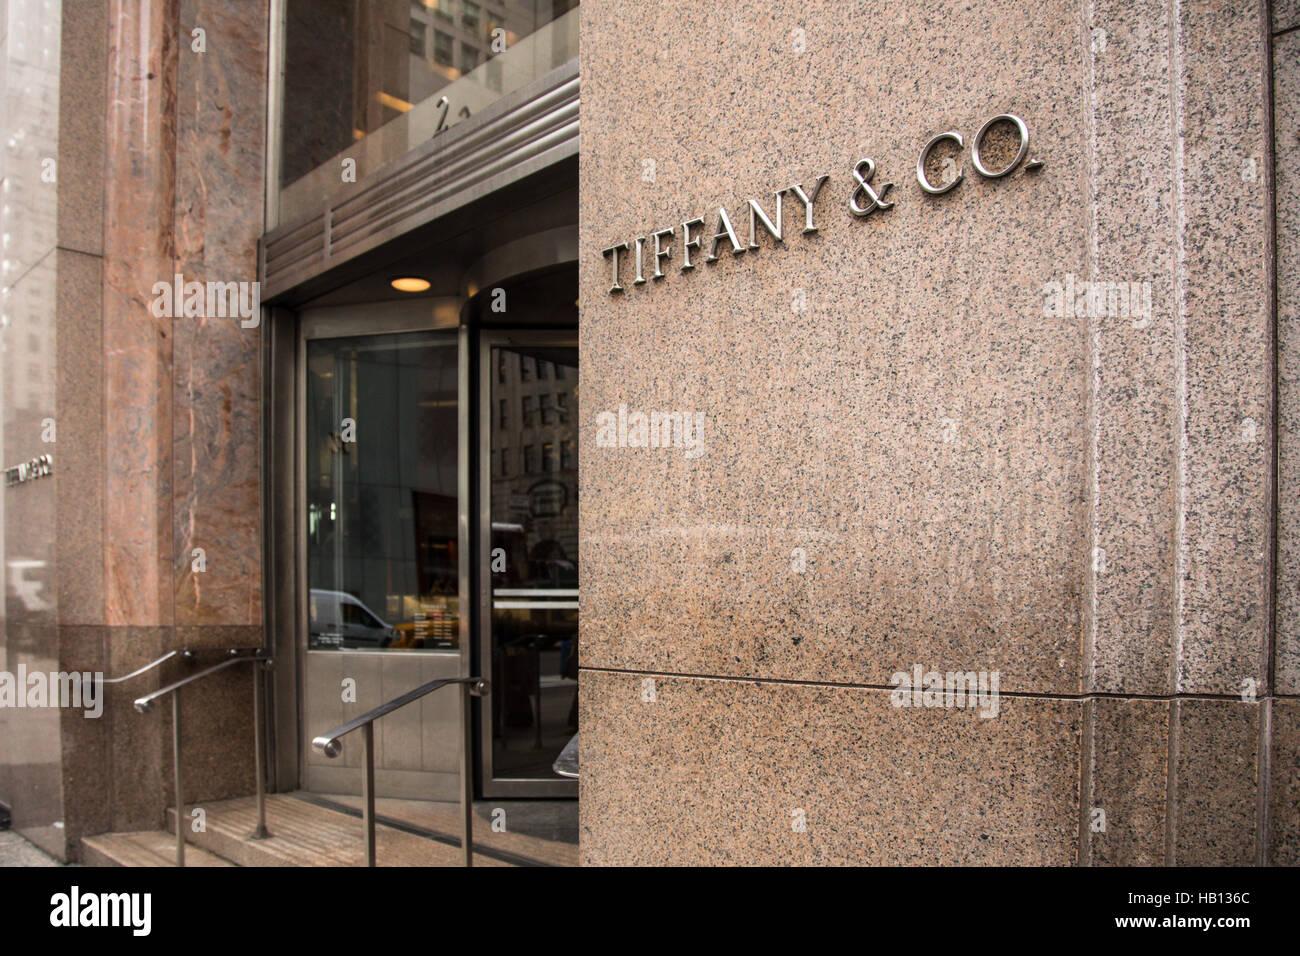 982ba1dbd0 Exterior view of Tiffany   Co in midtown Manhattan New York City ...